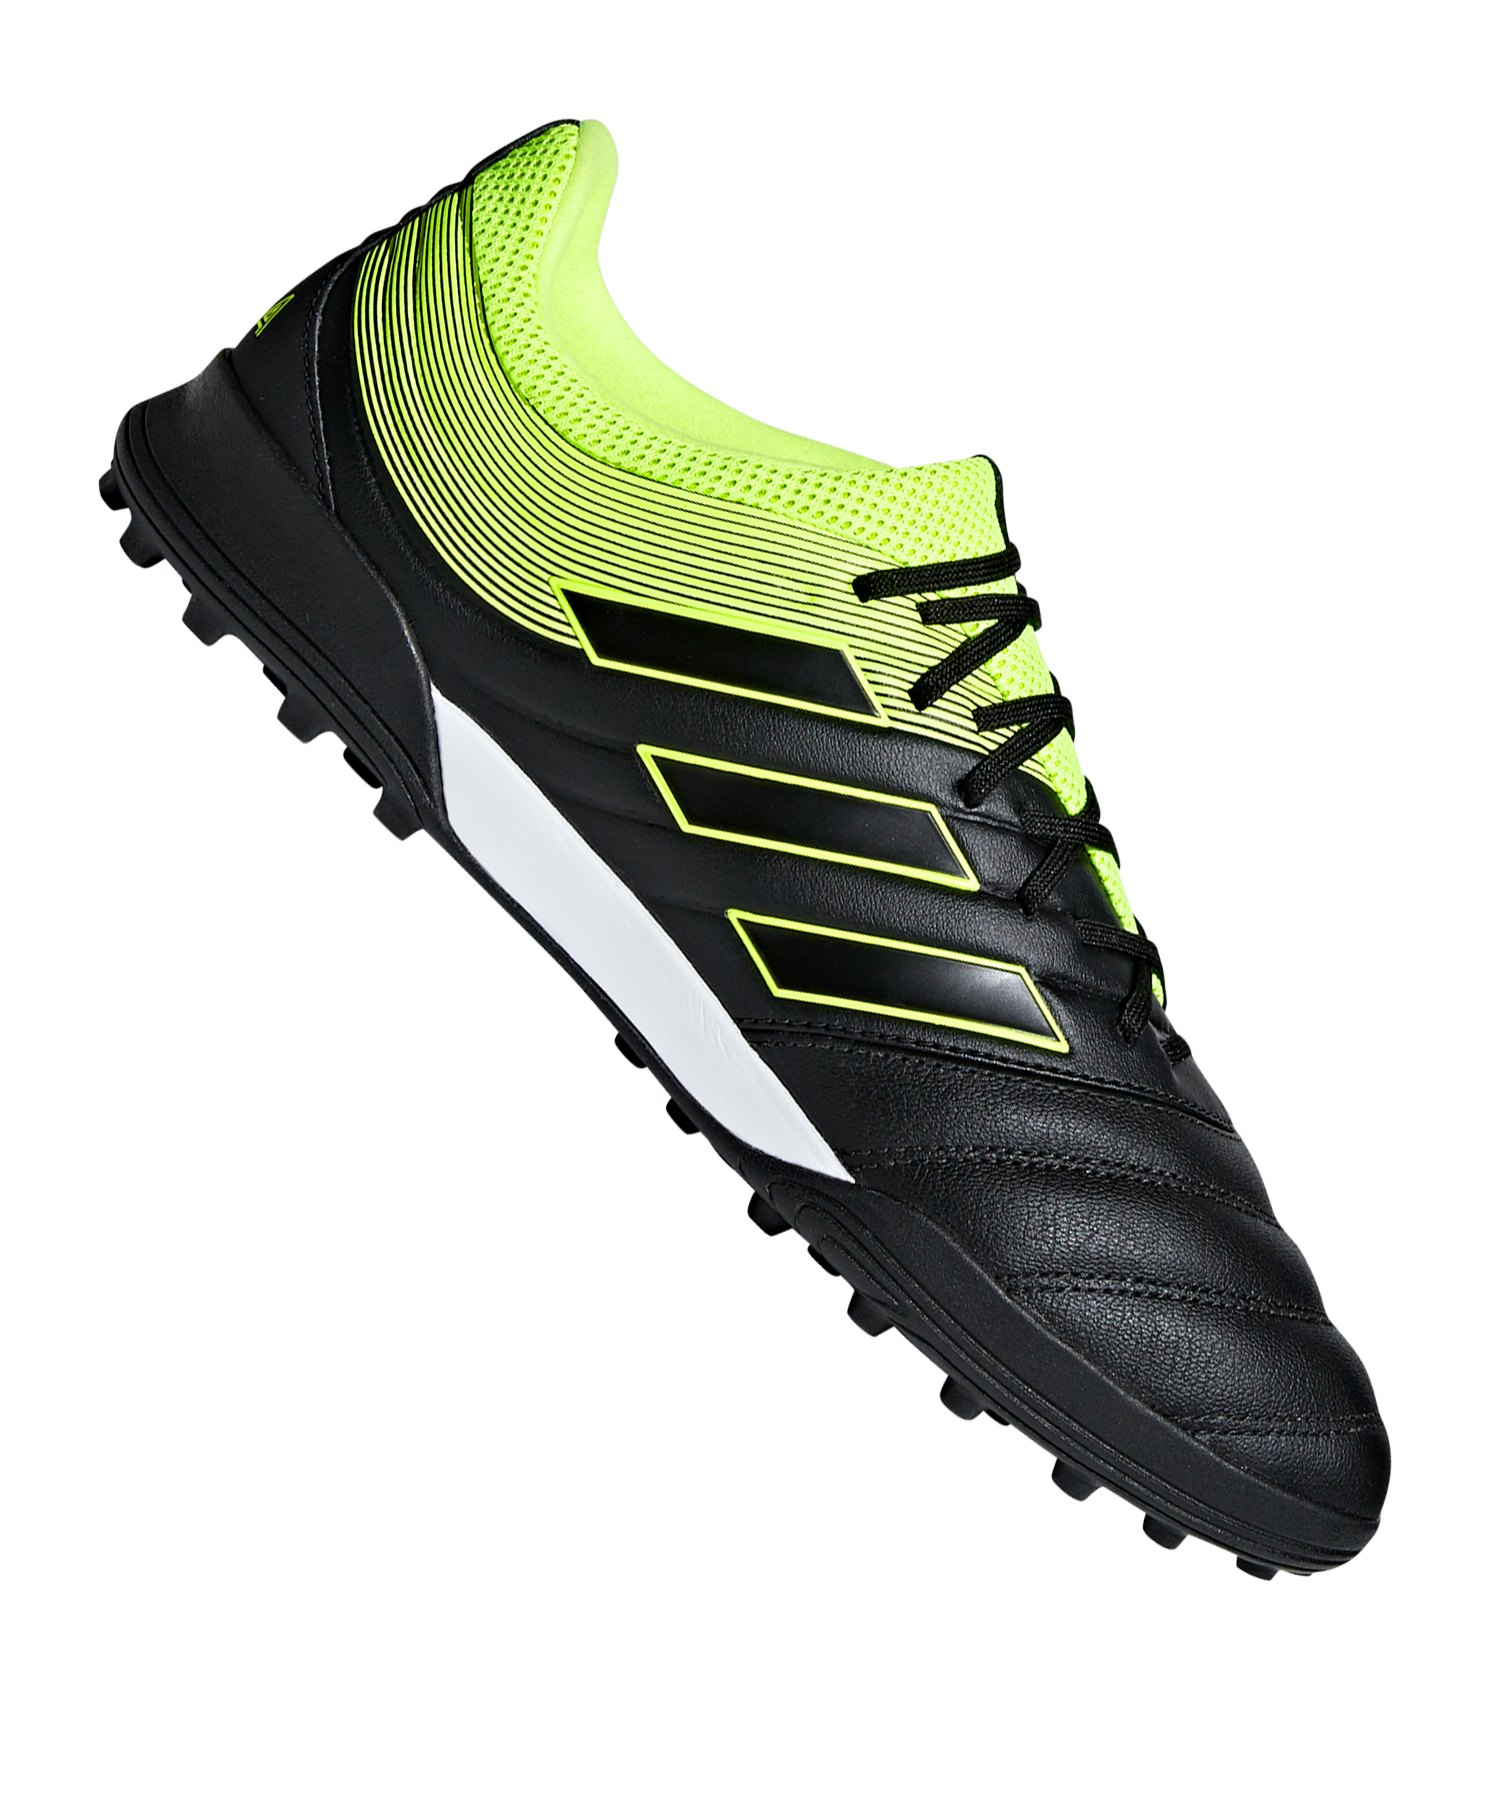 adidas COPA 19.3 TF Schwarz Gelb - schwarz